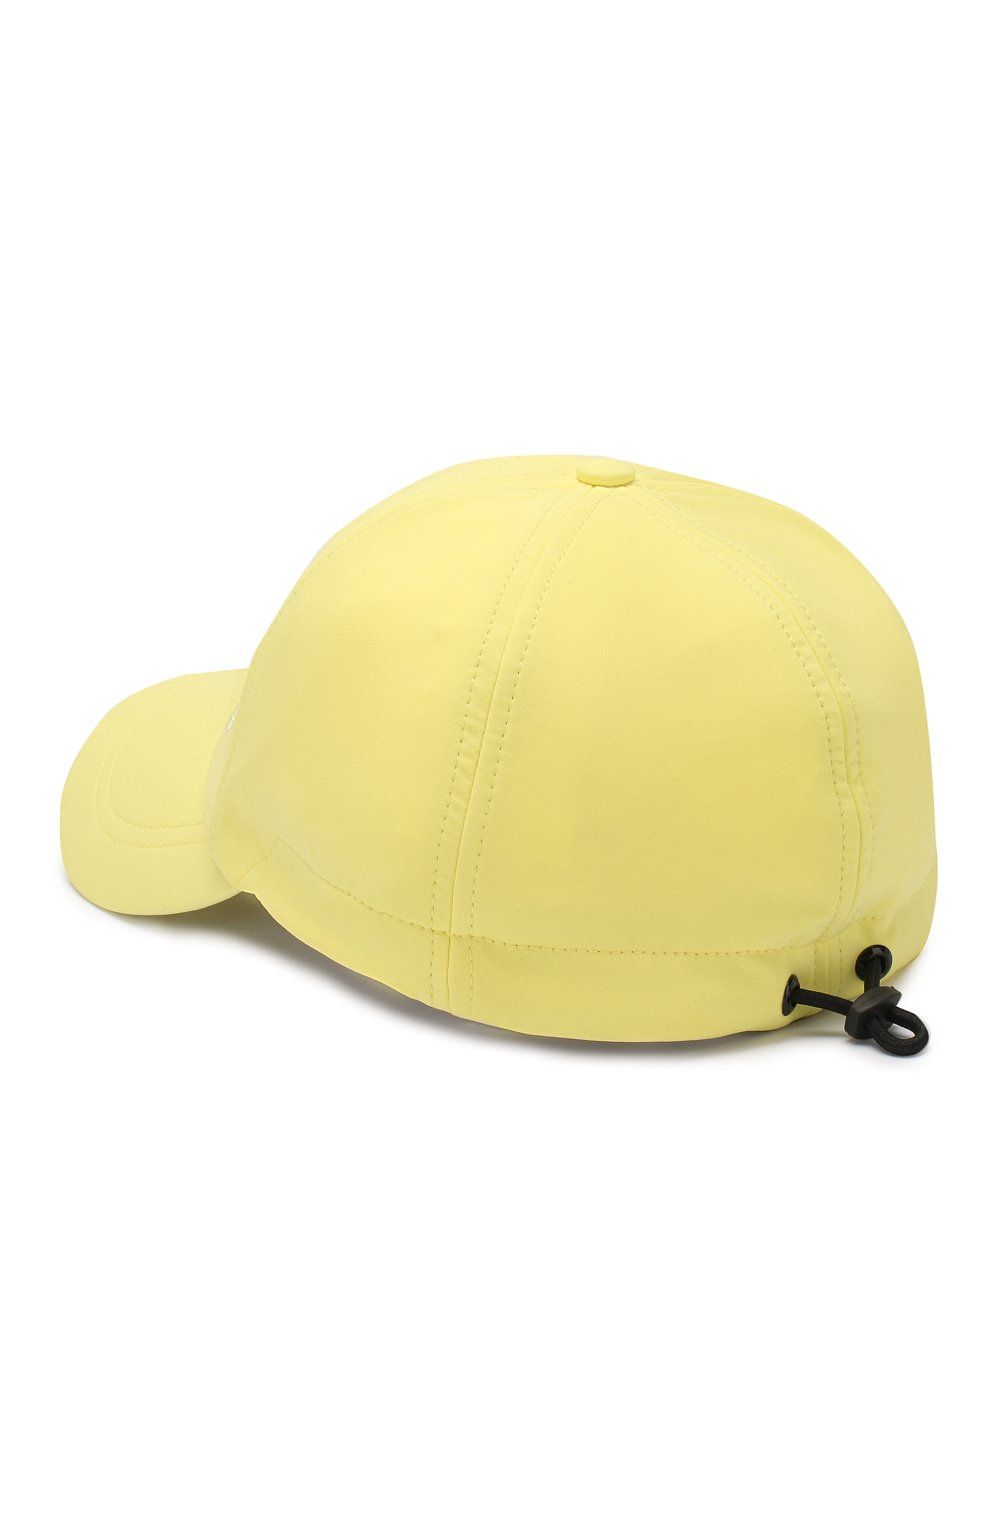 Мужской бейсболка STONE ISLAND желтого цвета, арт. 721599227 | Фото 2